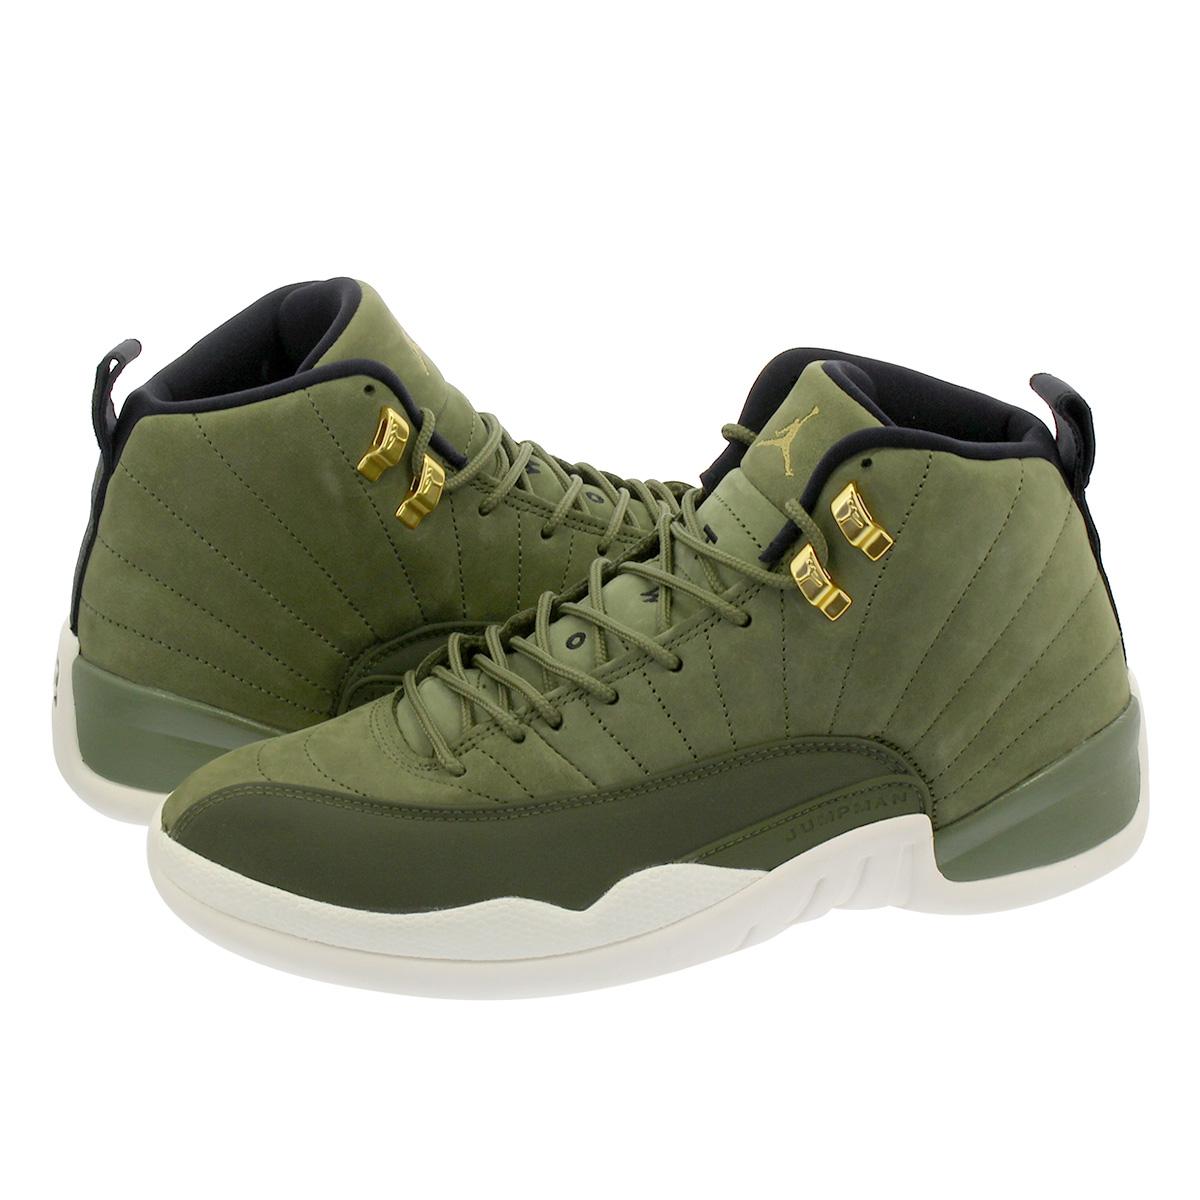 reputable site 3da40 18664 NIKE AIR JORDAN 12 RETRO Nike Air Jordan 12 nostalgic OLIVE CANVAS/METALLIC  GOLD/BLACK/SAIL 130,690-301